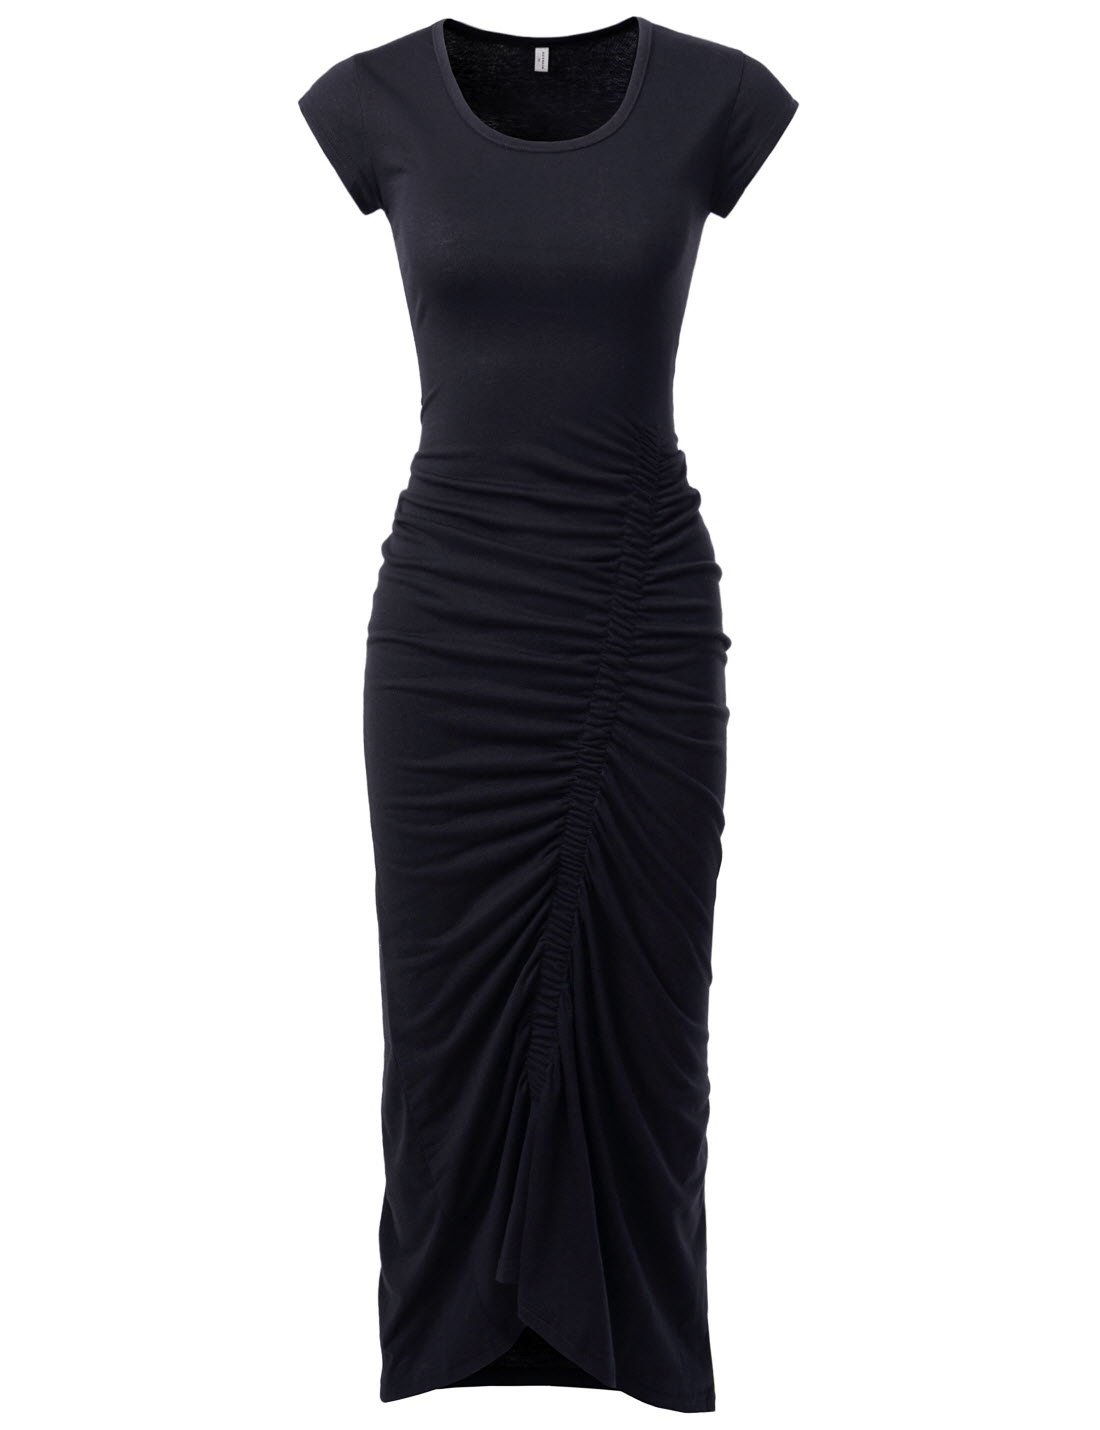 NEARKIN (NKNKWBD801 Womens Cap Sleeve Figure Hugging Scoop Neck Shirred Maxi Dress Black US M(Tag Size L)